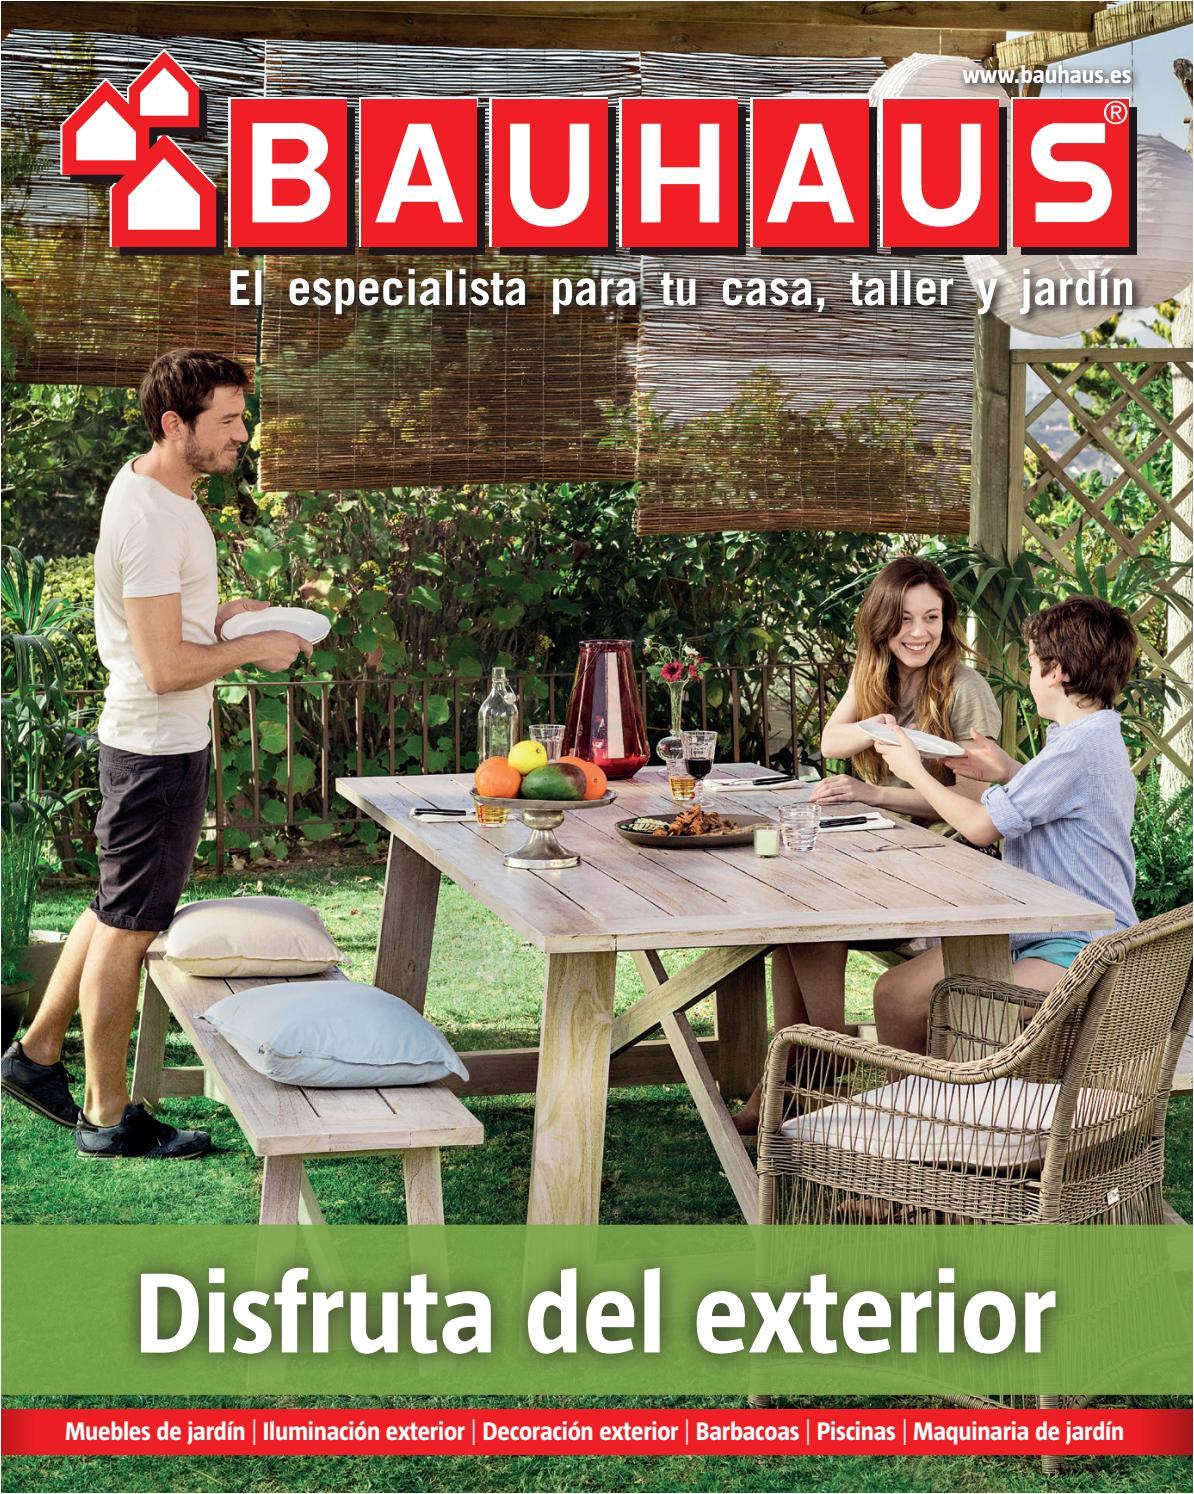 Muebles Baratas En Dallas Tx Especial Jarda N Bauhaus by Bauhaus issuu